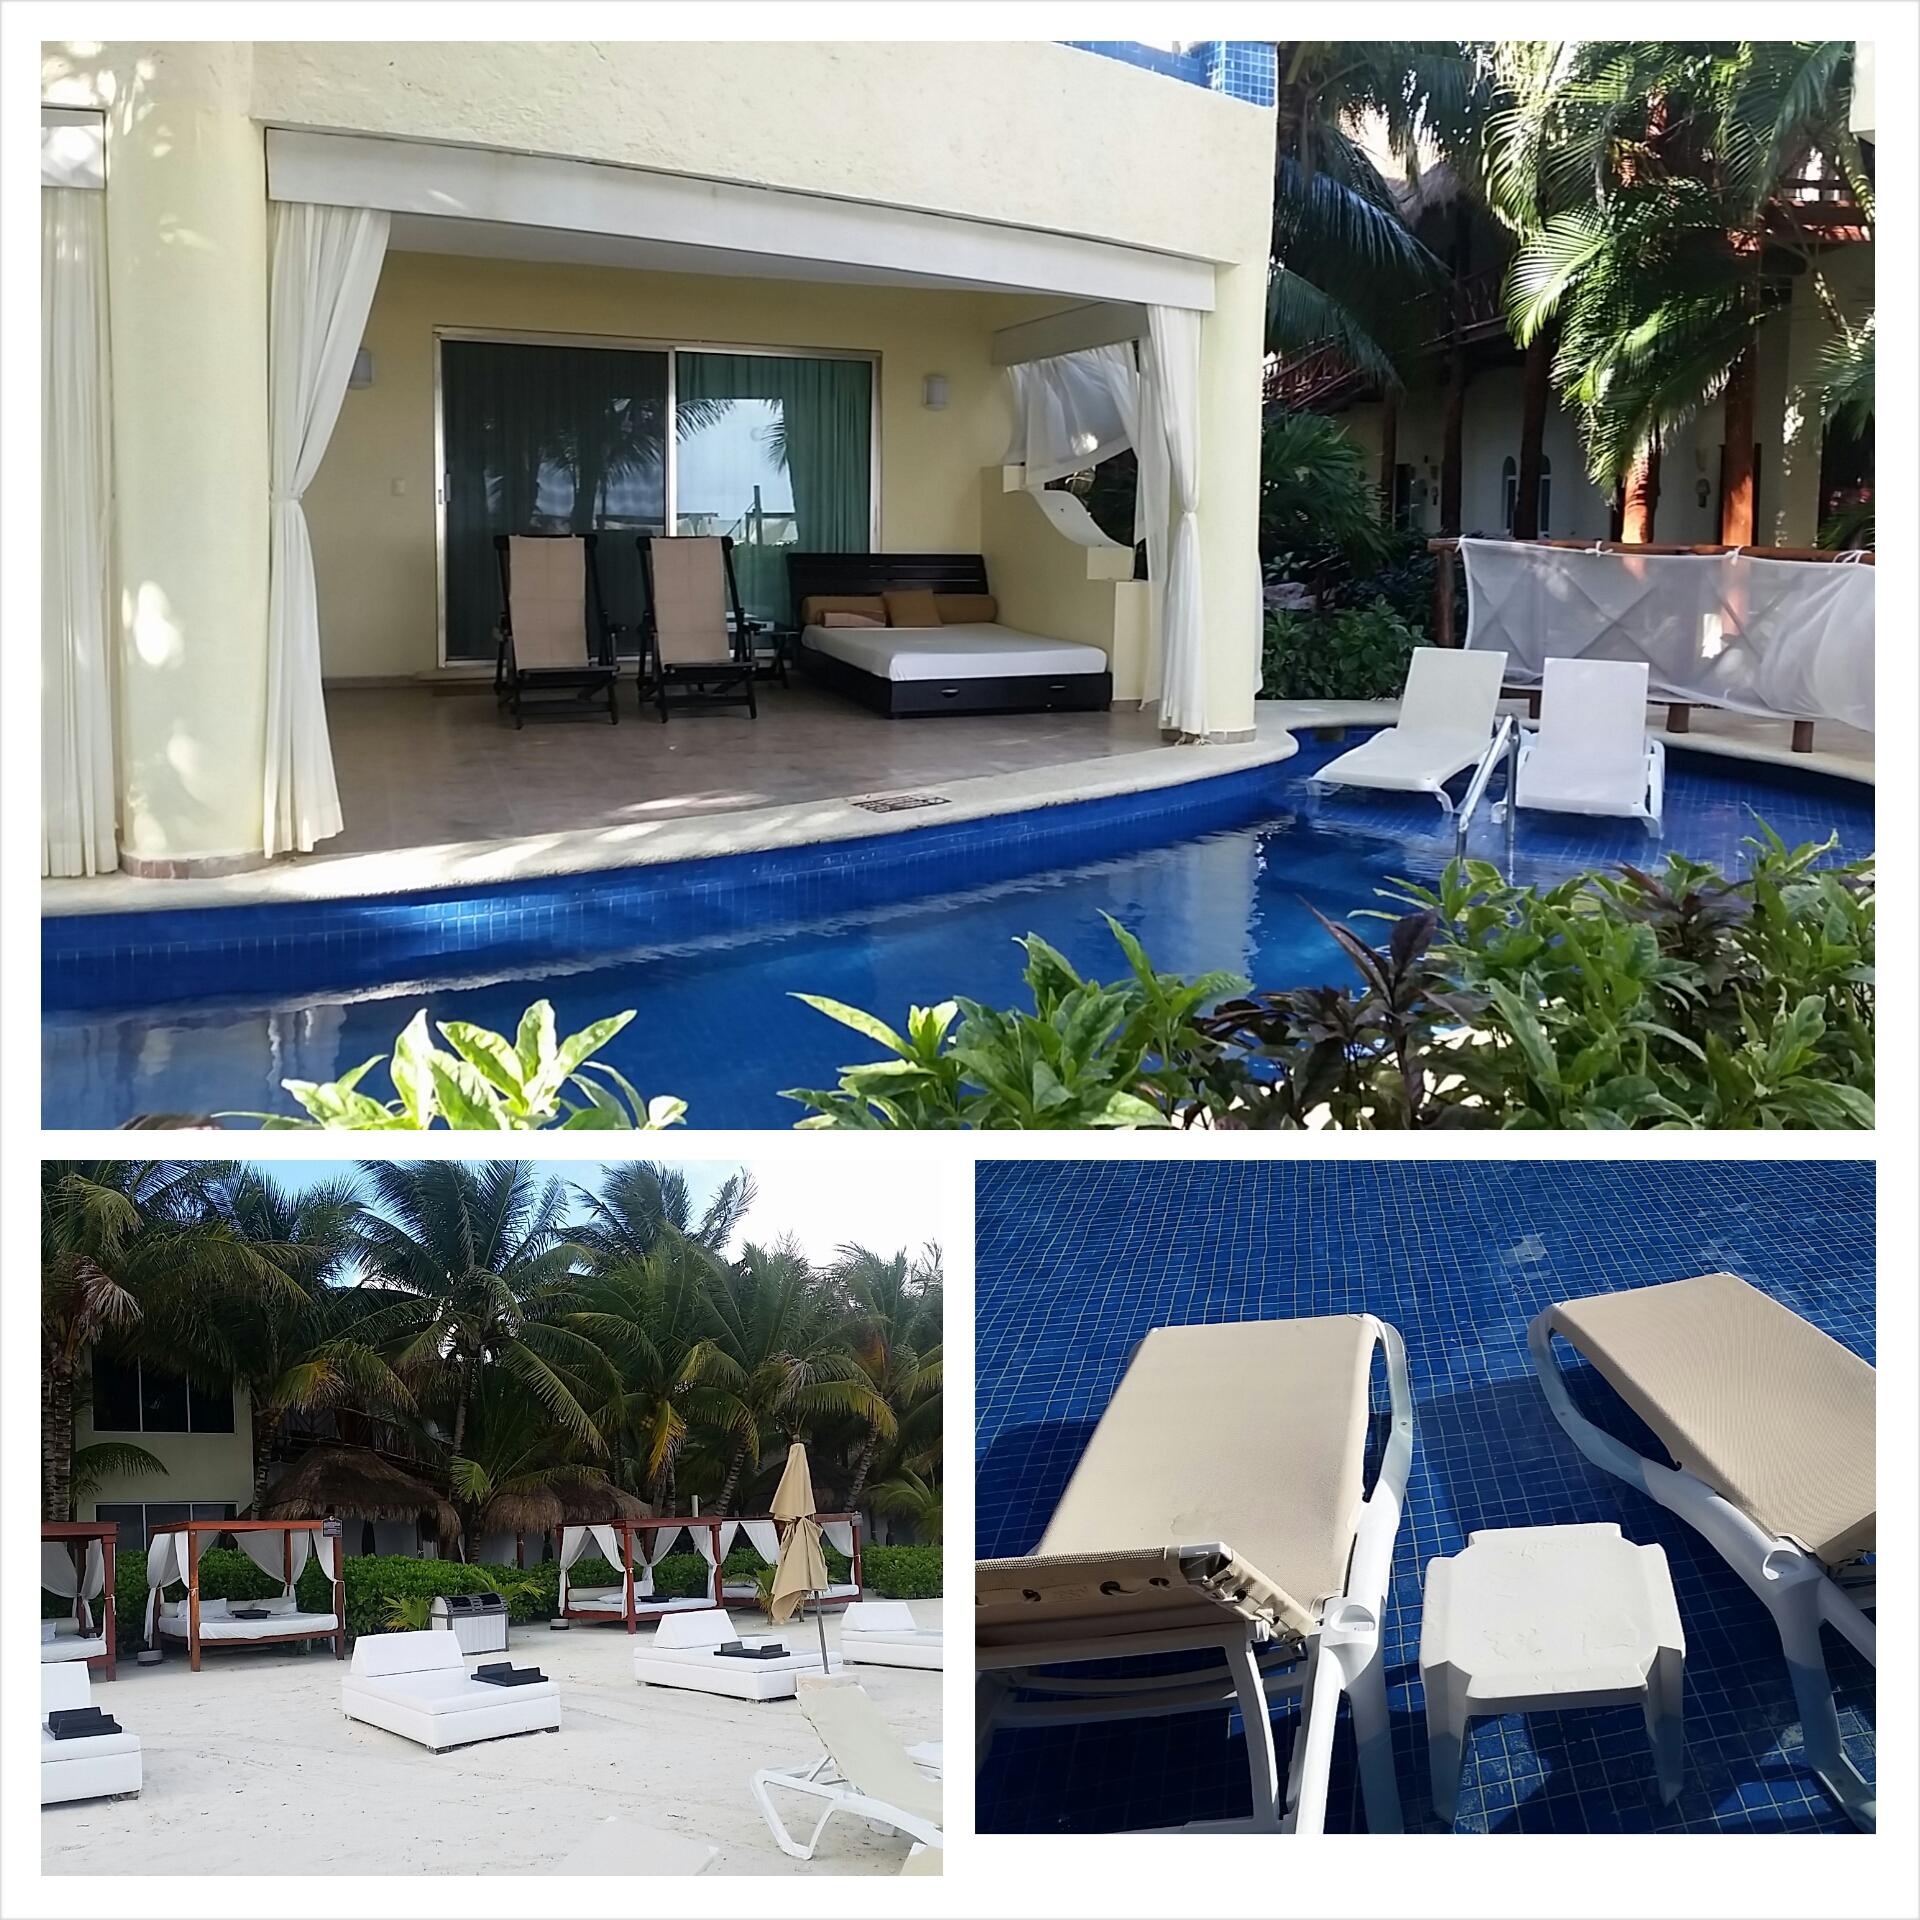 90 minute presentation vacations mexico